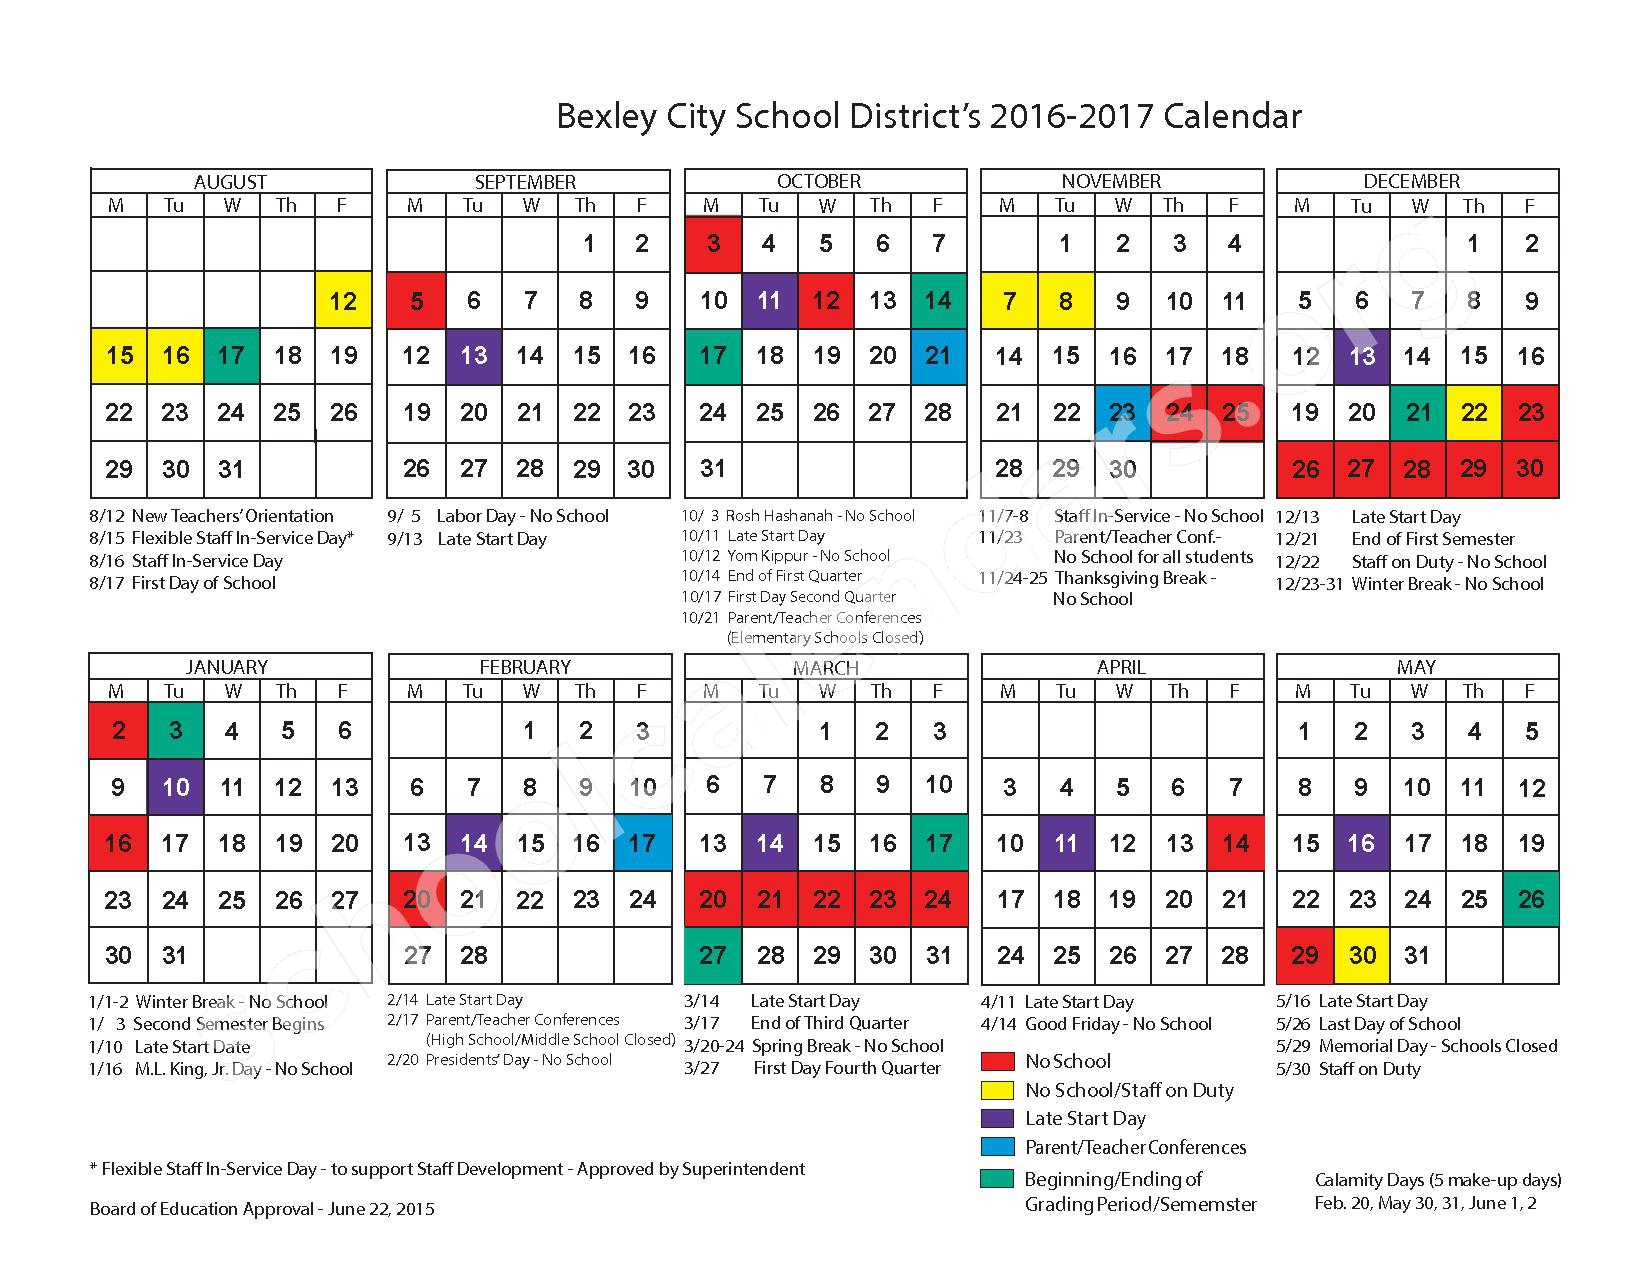 2016 - 2017 District Calendar – Bexley City School District – page 1